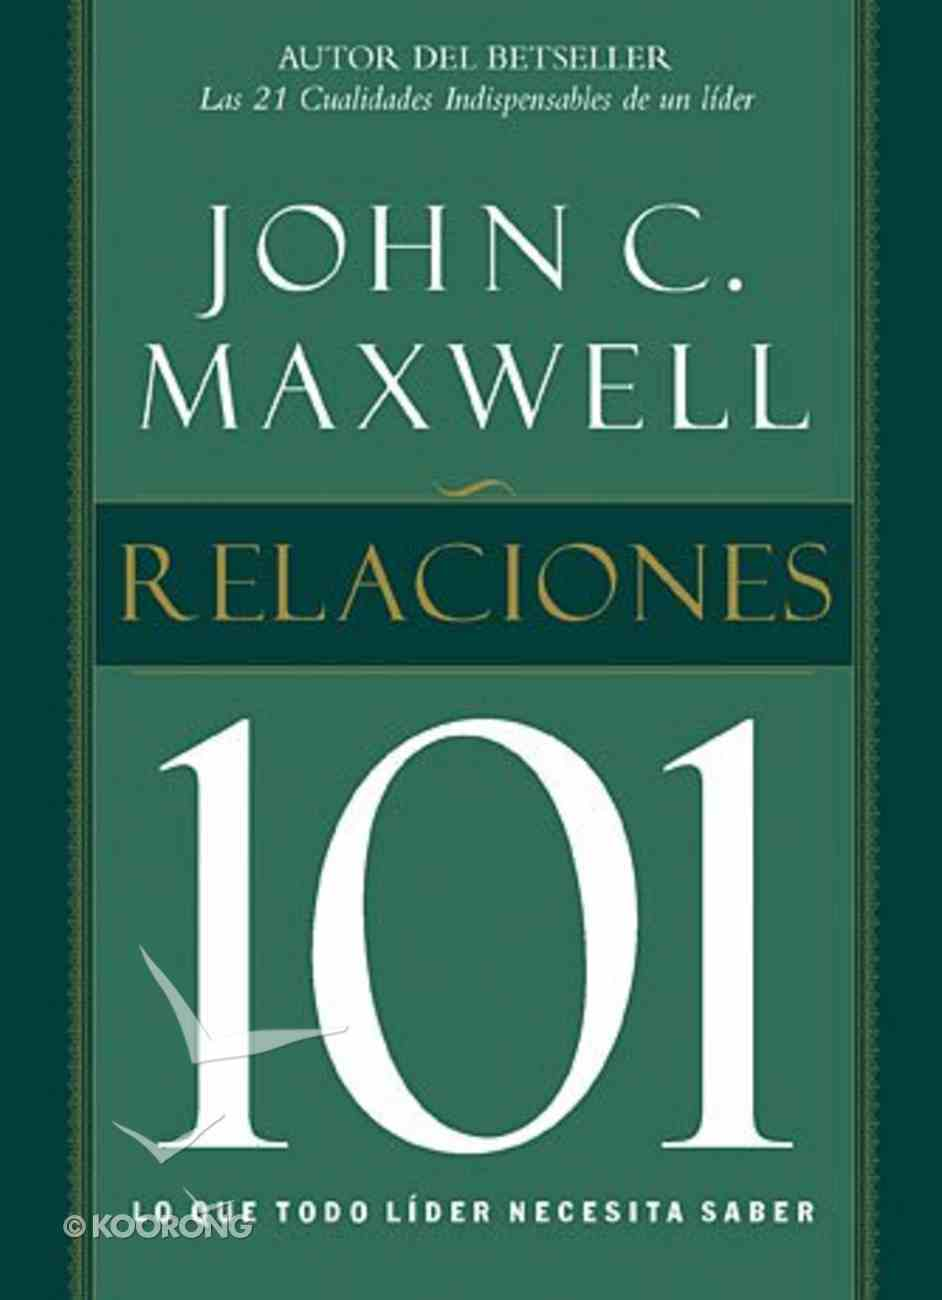 Relaciones 101 (Relationships 101) Paperback